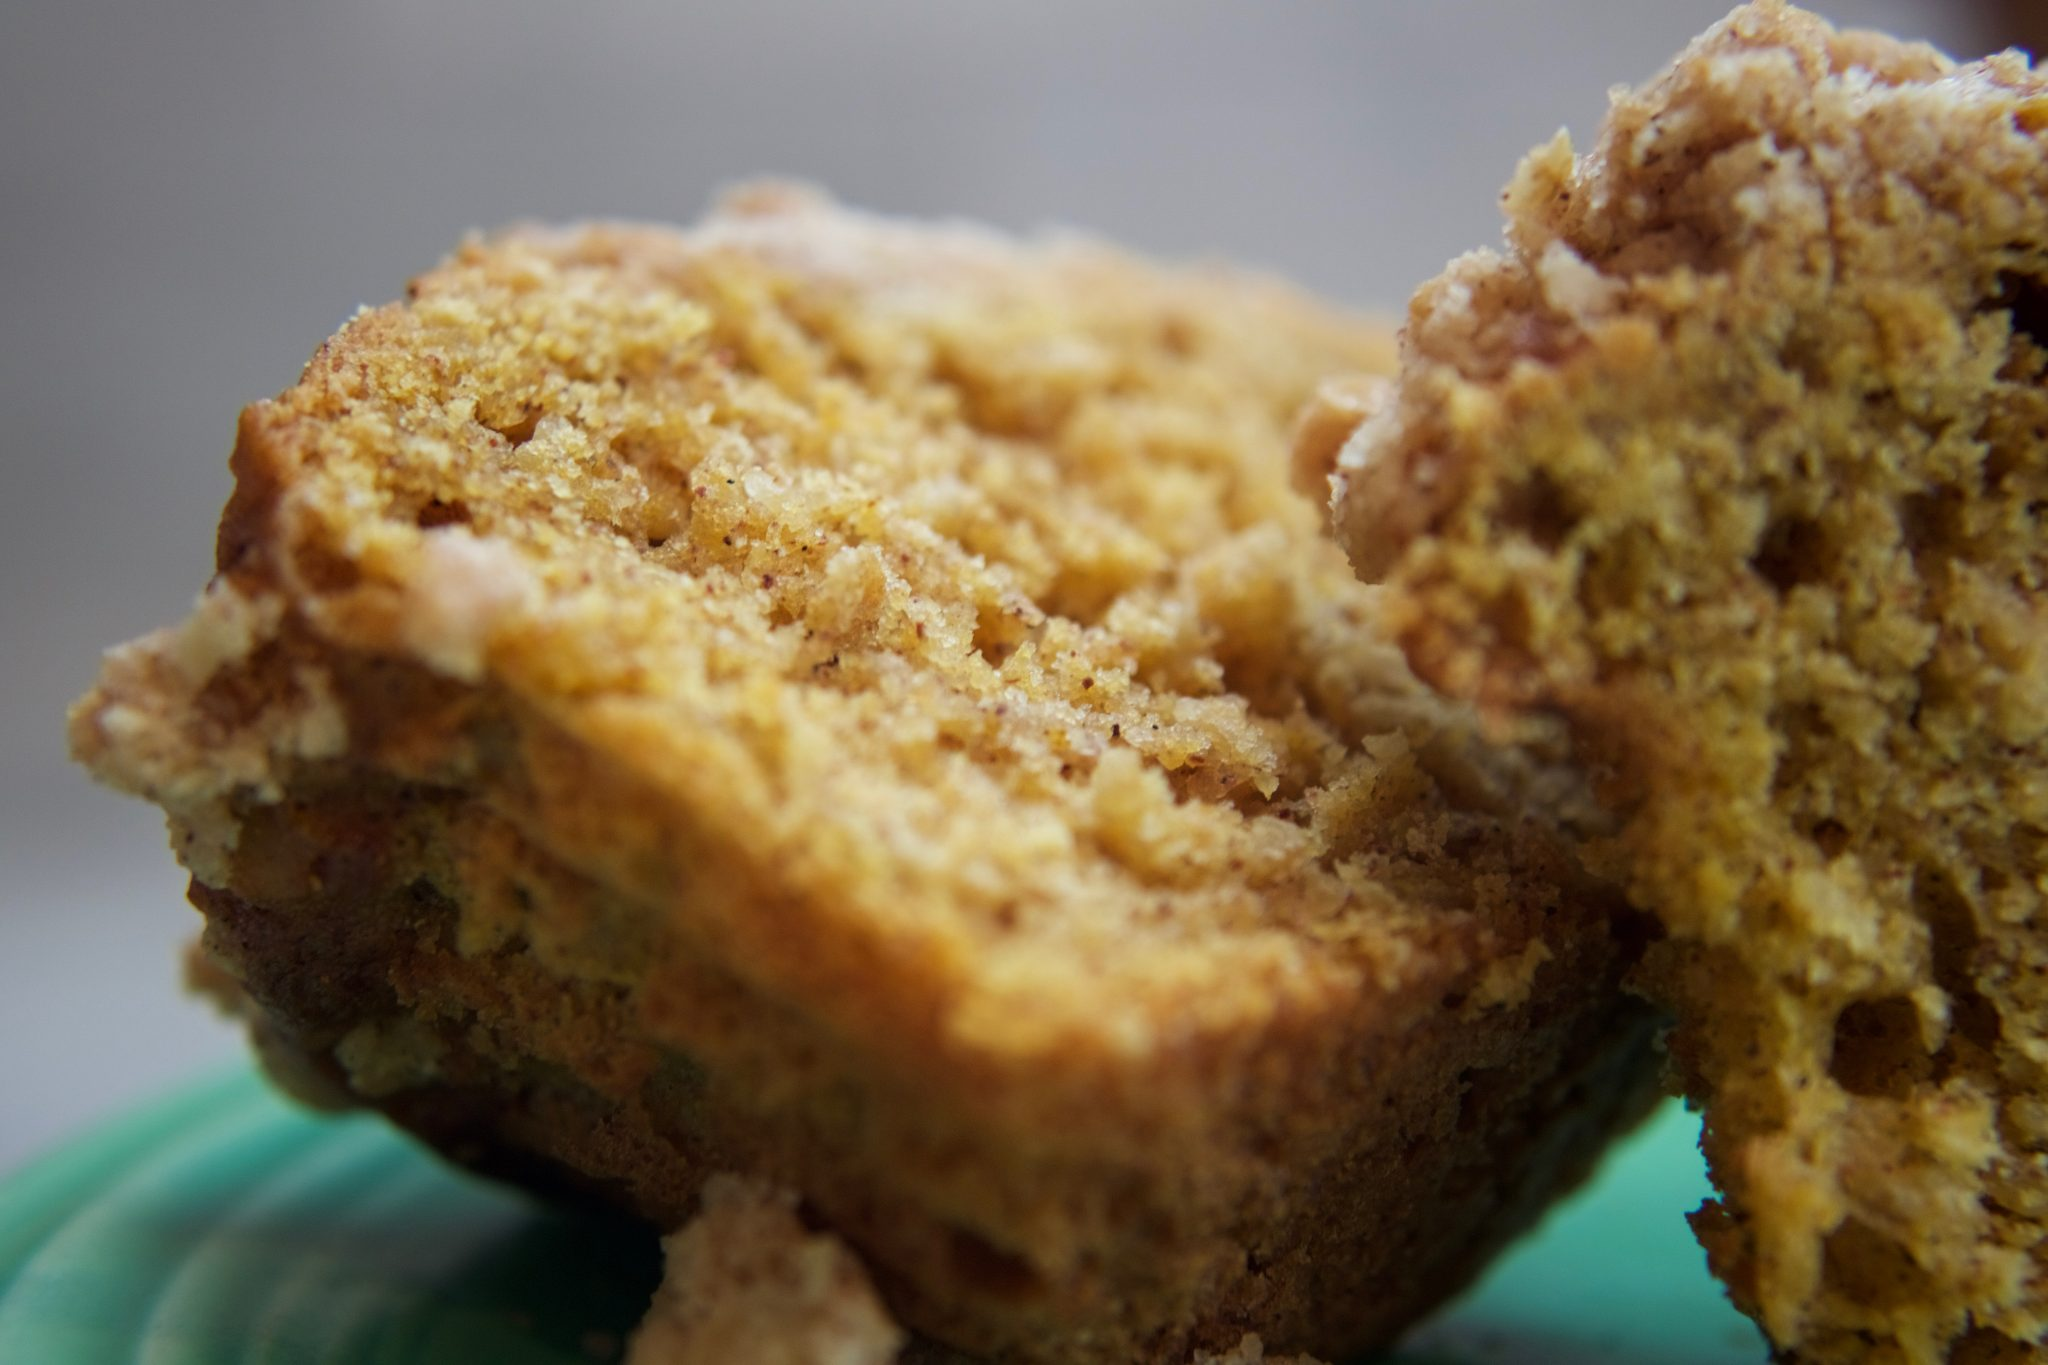 homemade bakery style muffin vanilla bean freshly ground nutmeg